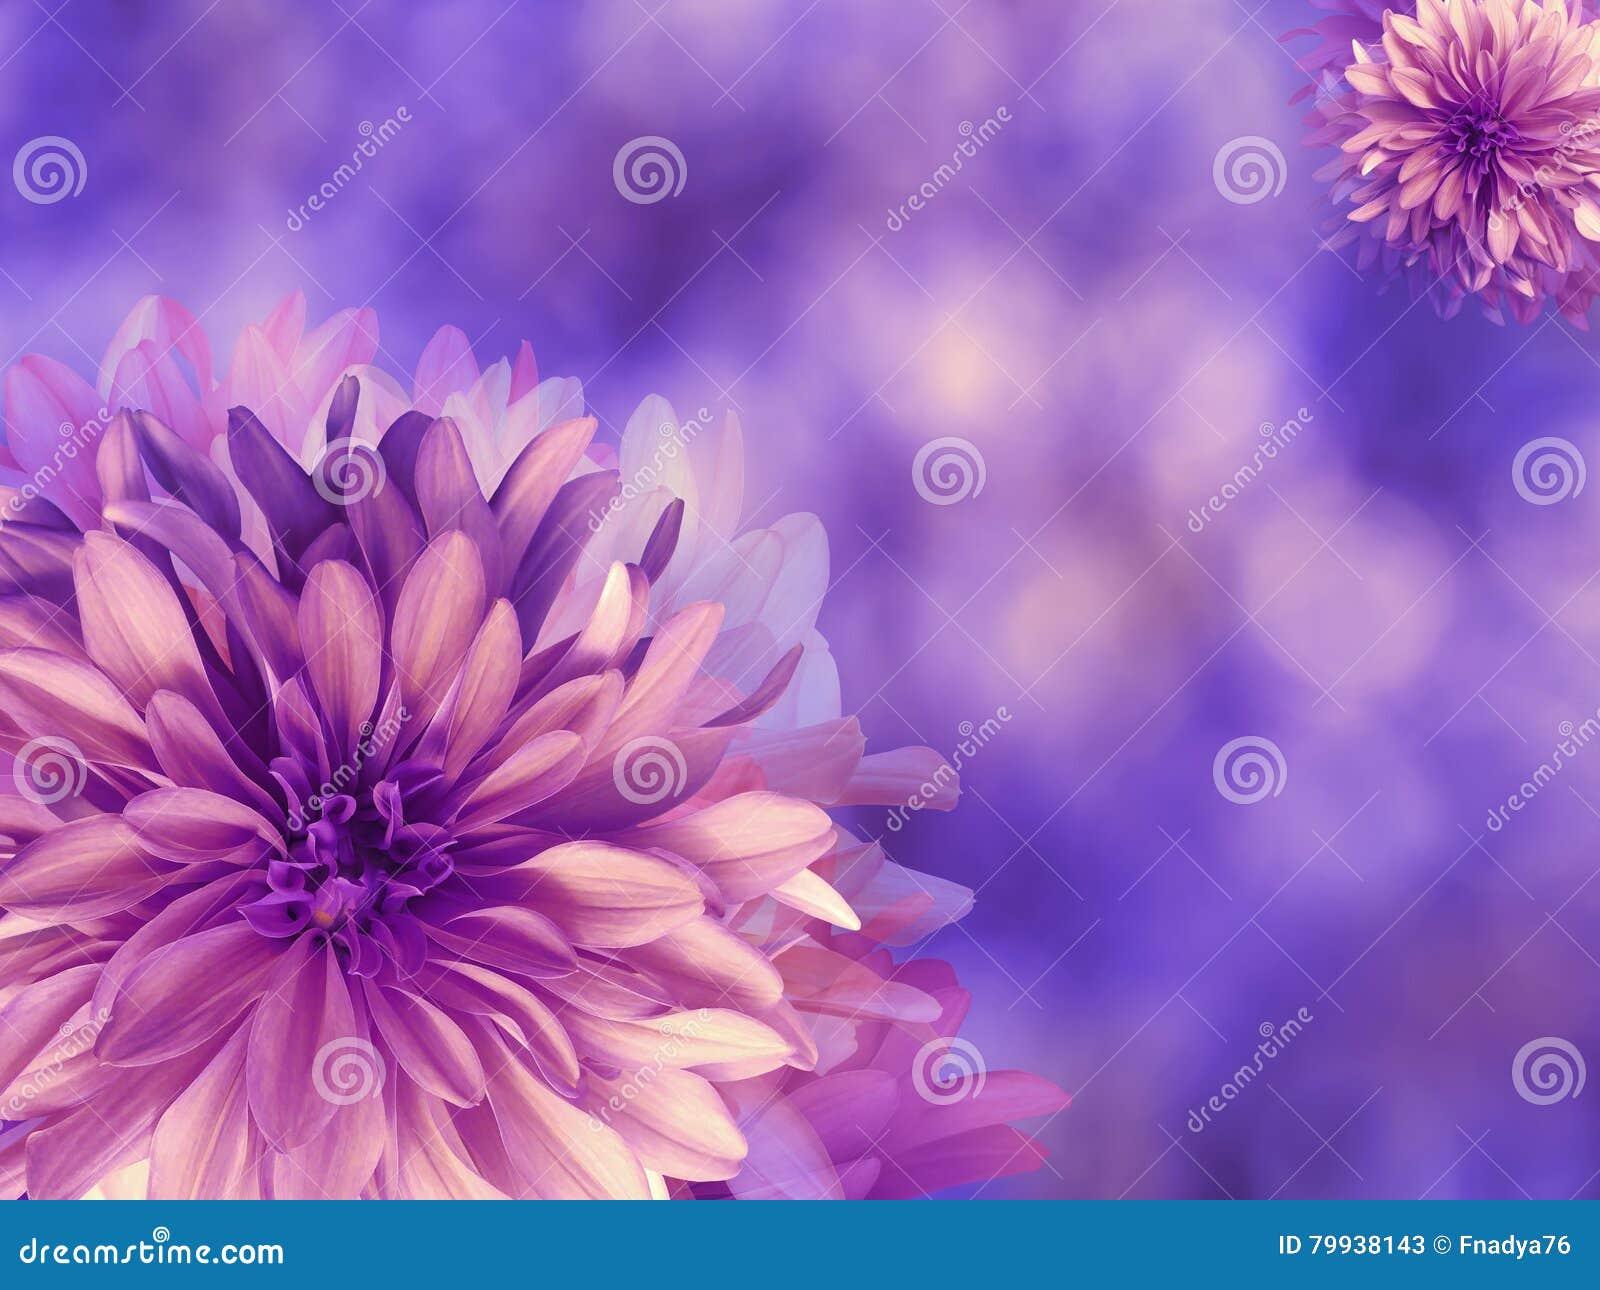 Purple Pink Autumn Flowers On Blue Violet Blurred Background